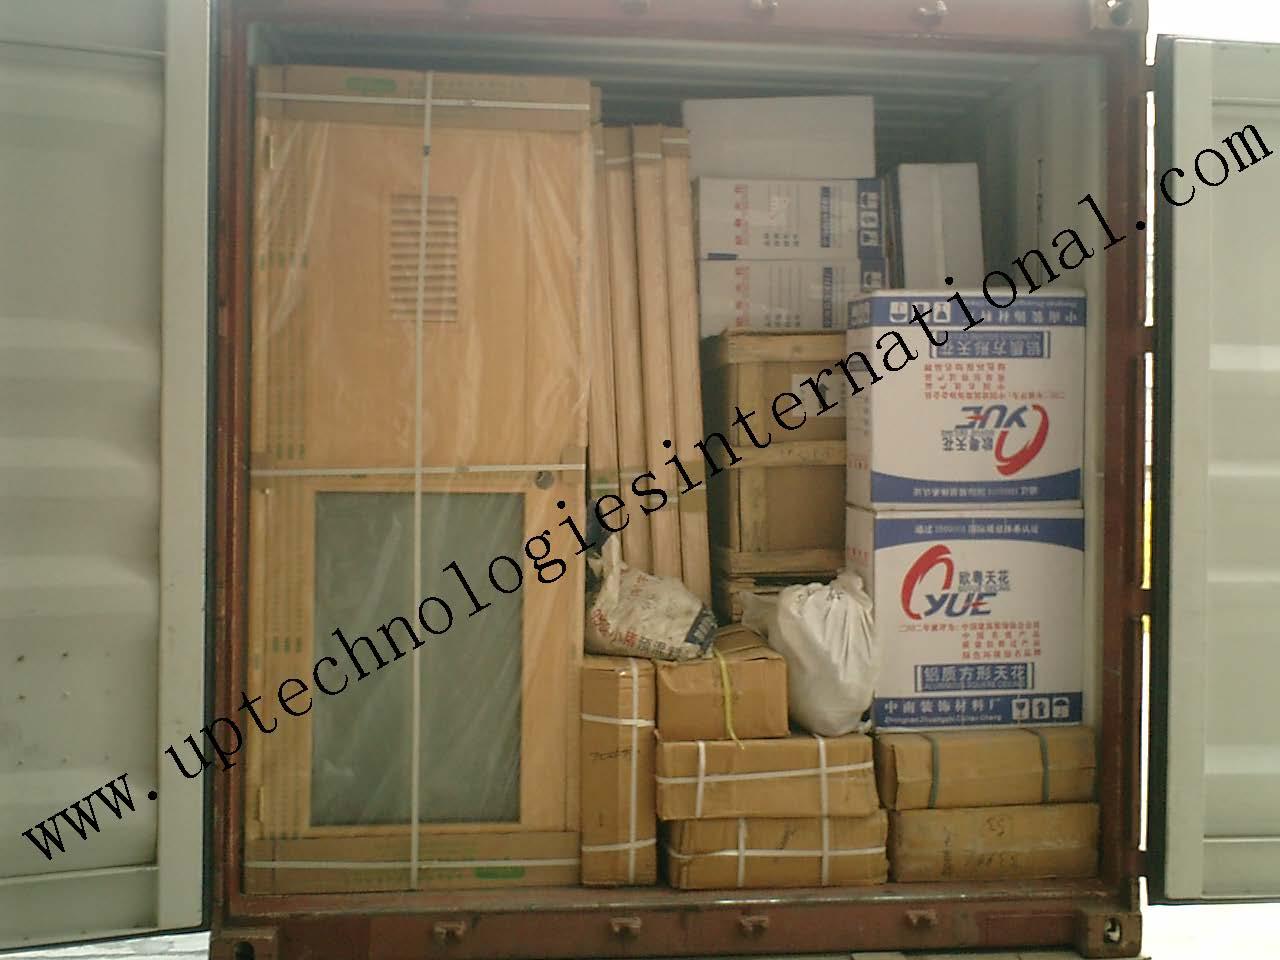 logistic service(CN)